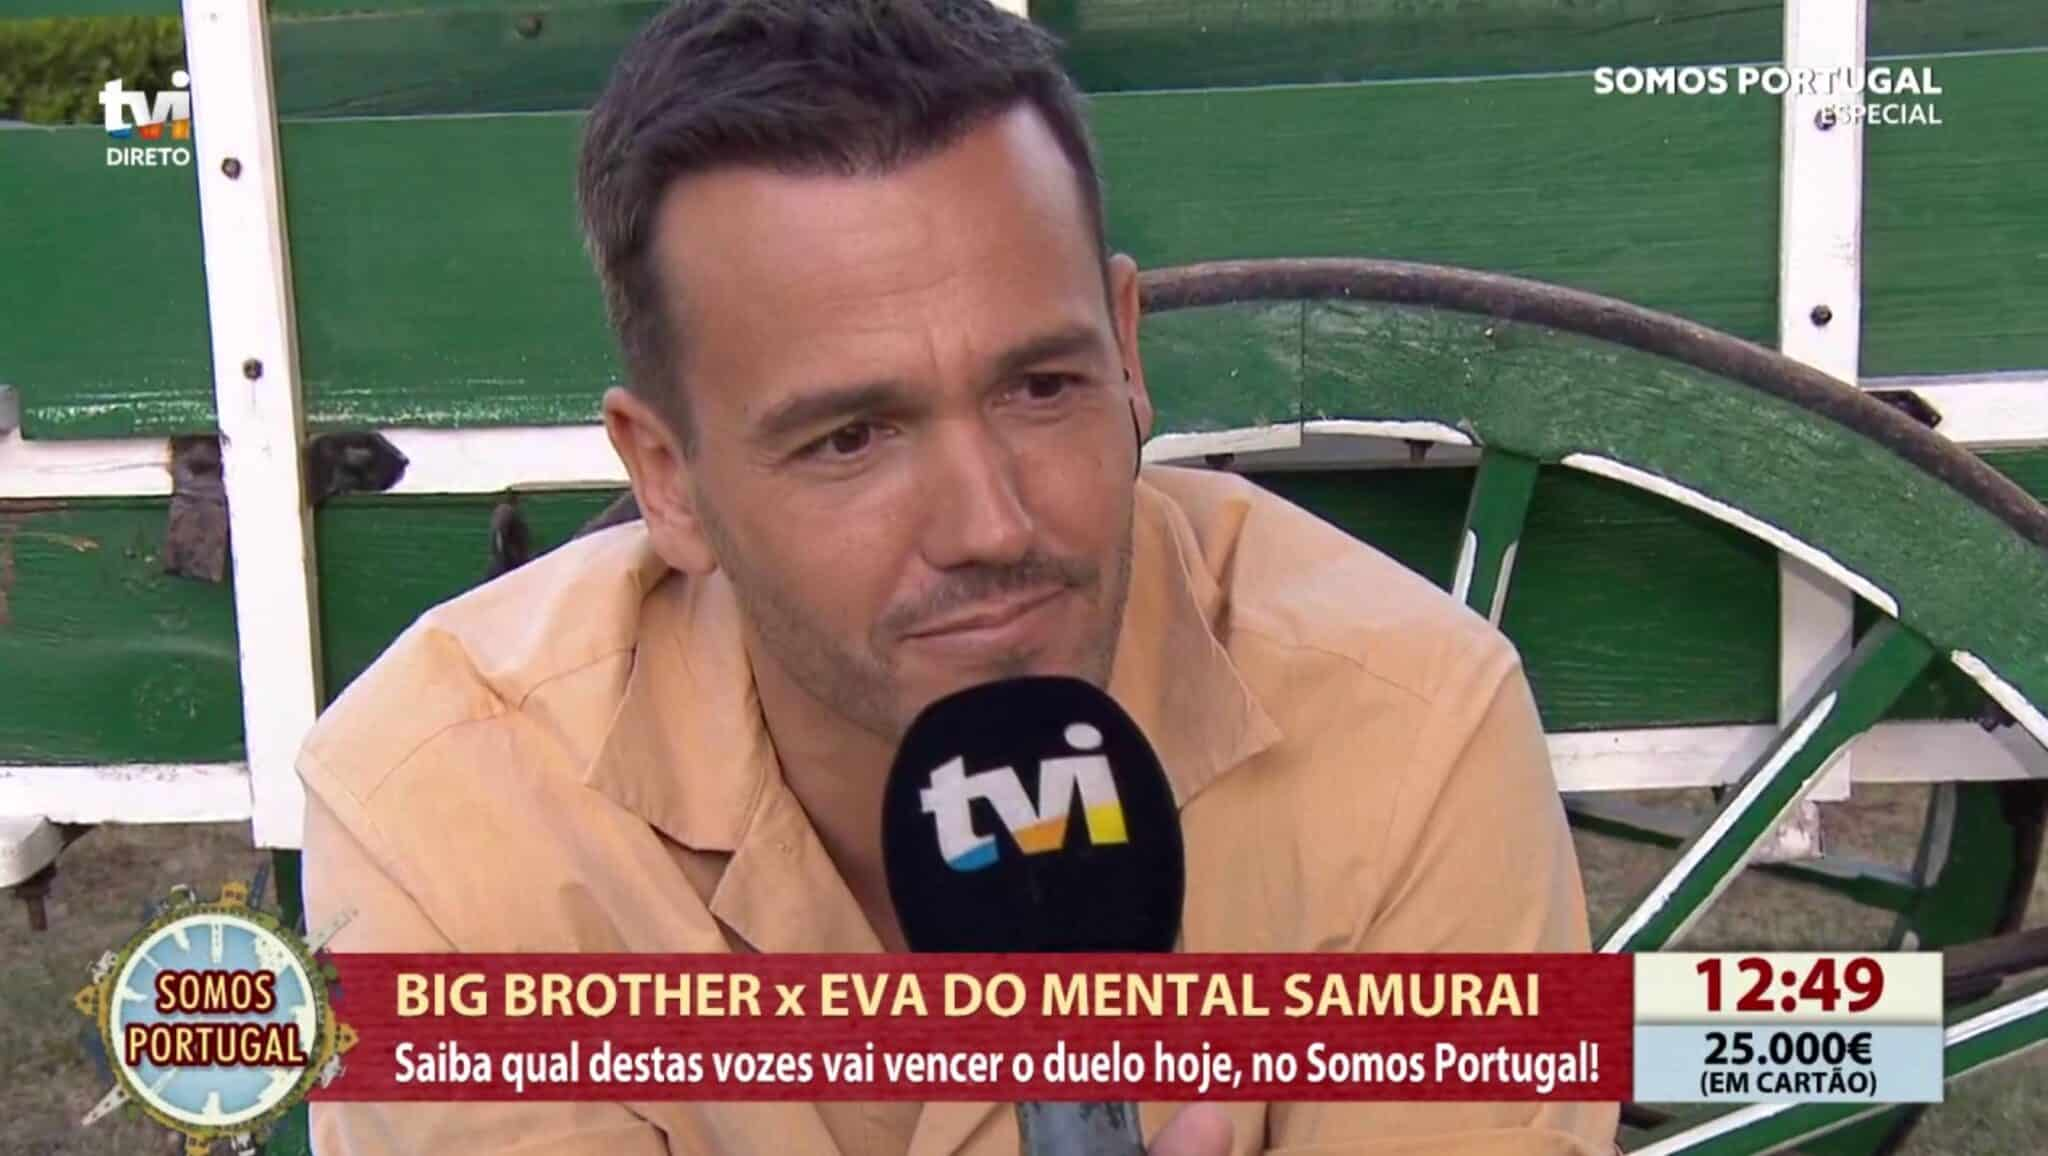 somos-portugal-bronca-big-brother-eva